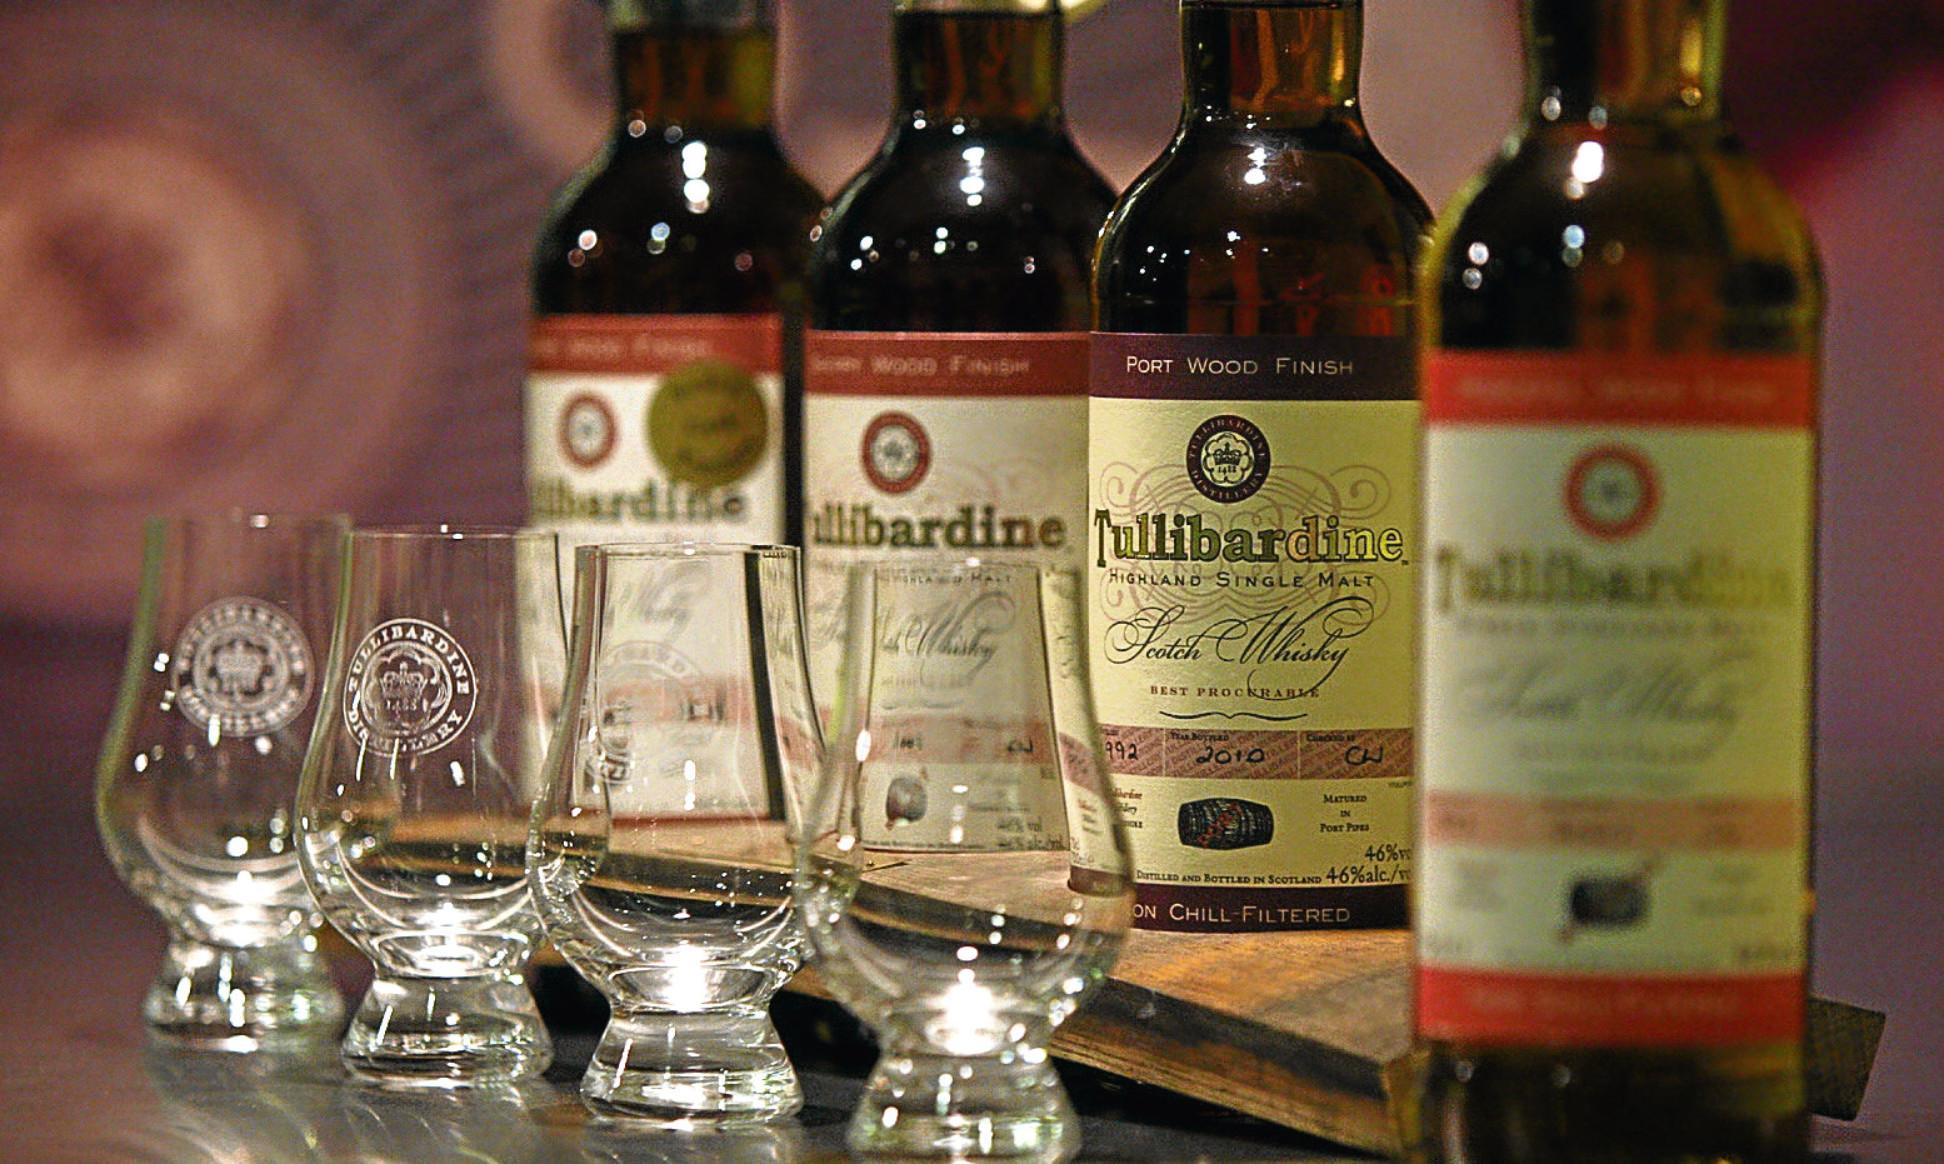 Tullibardine malt whisky is in strong demand